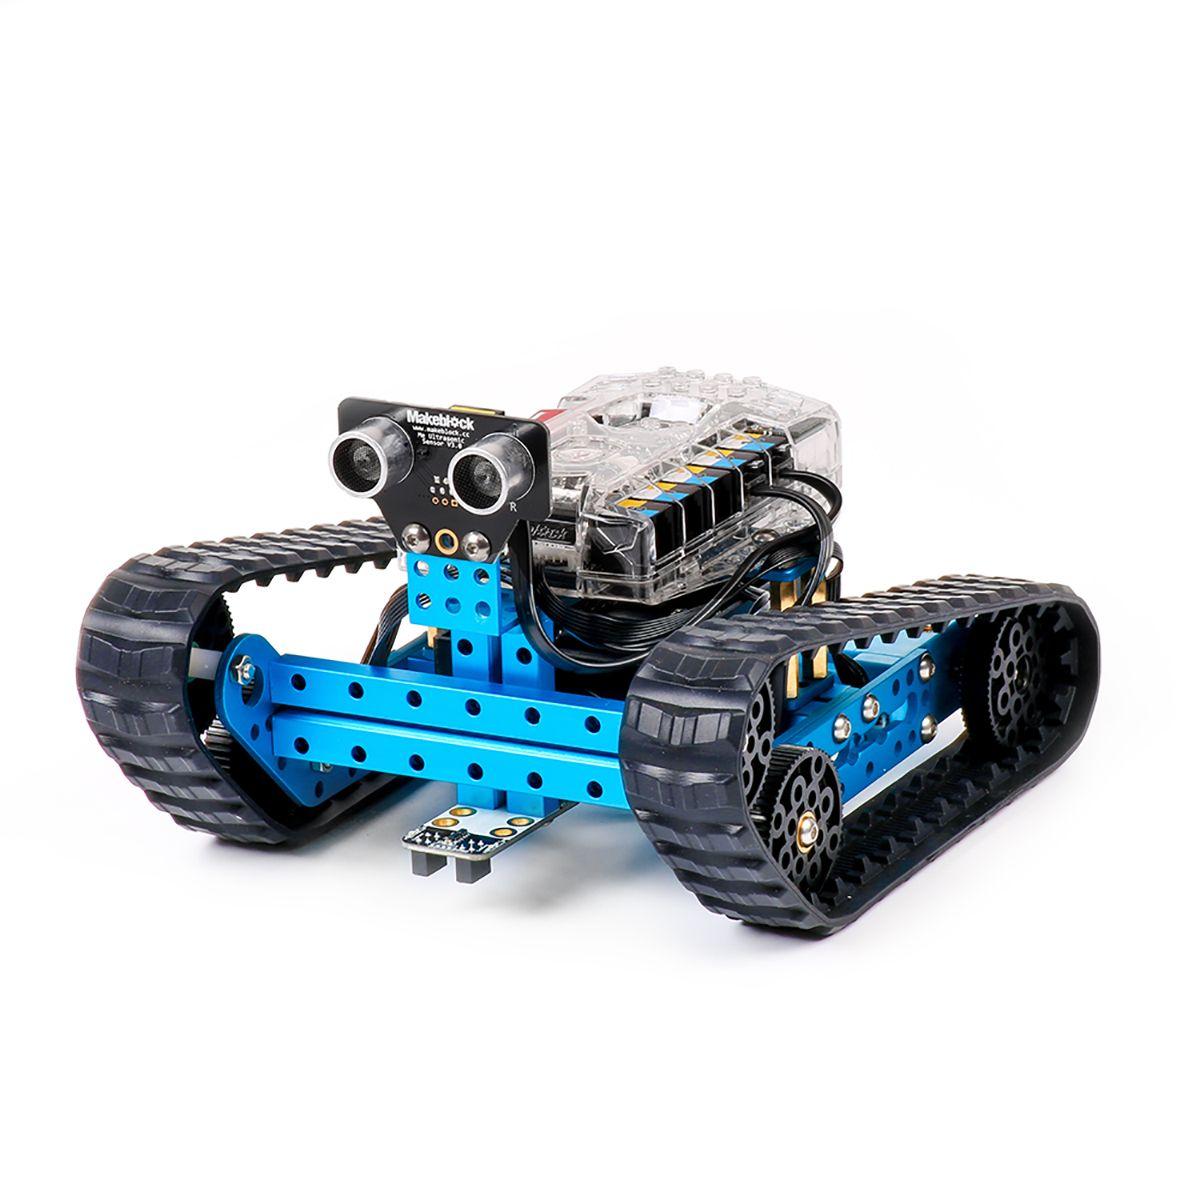 ROBOT EDUCATIVO MBOT RANGER BLUETOOTH MAKEBLOCK